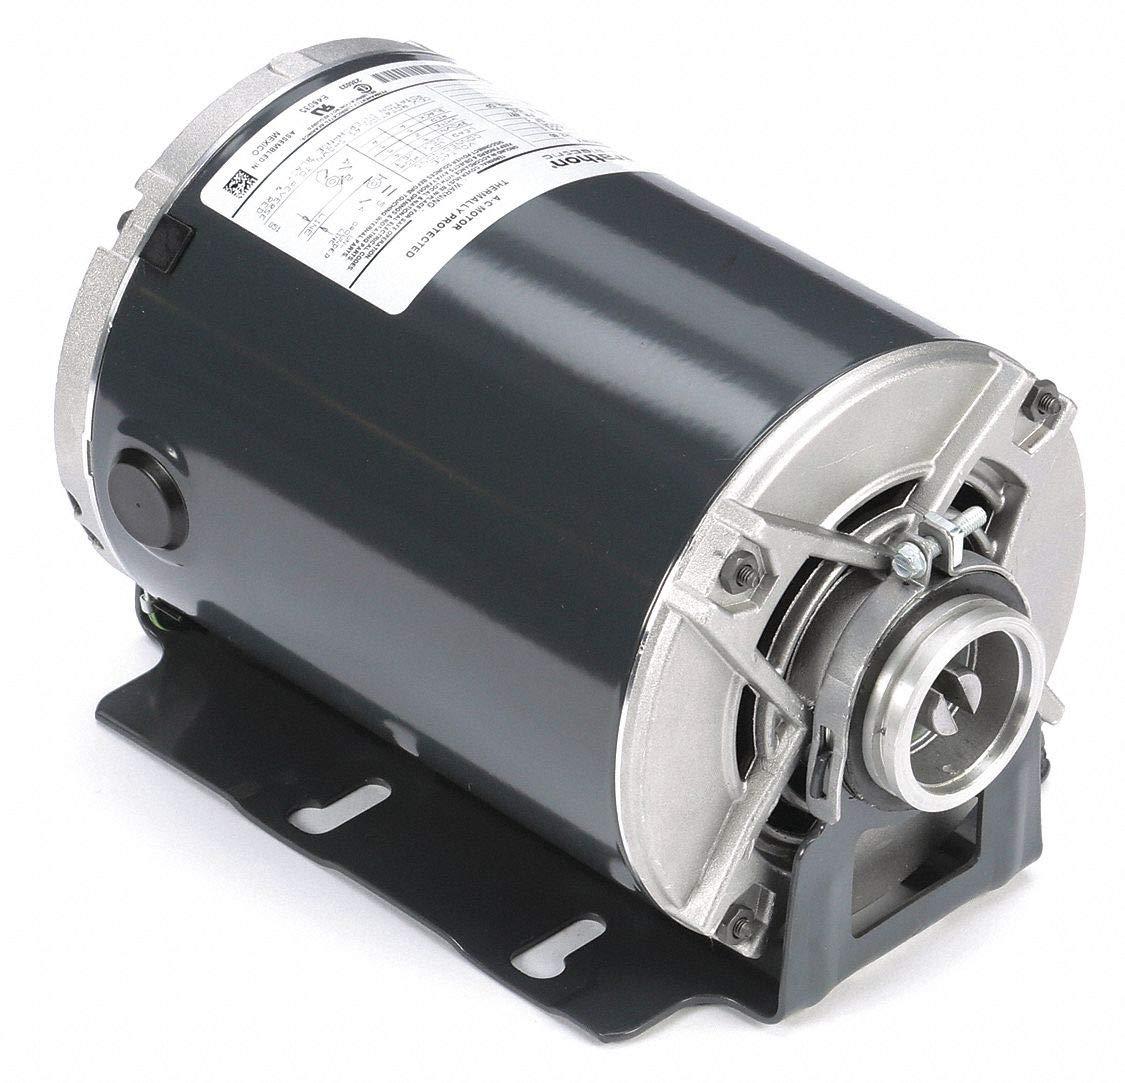 Marathon HG714 48Y Frame Open Drip Proof 5KH37PNA479X Carbonator Pump Motor, 3/4 hp, 1800 RPM, 115/230 VAC, 1 Split Phase, 1 Speed, Ball Bearing, Rigid Base